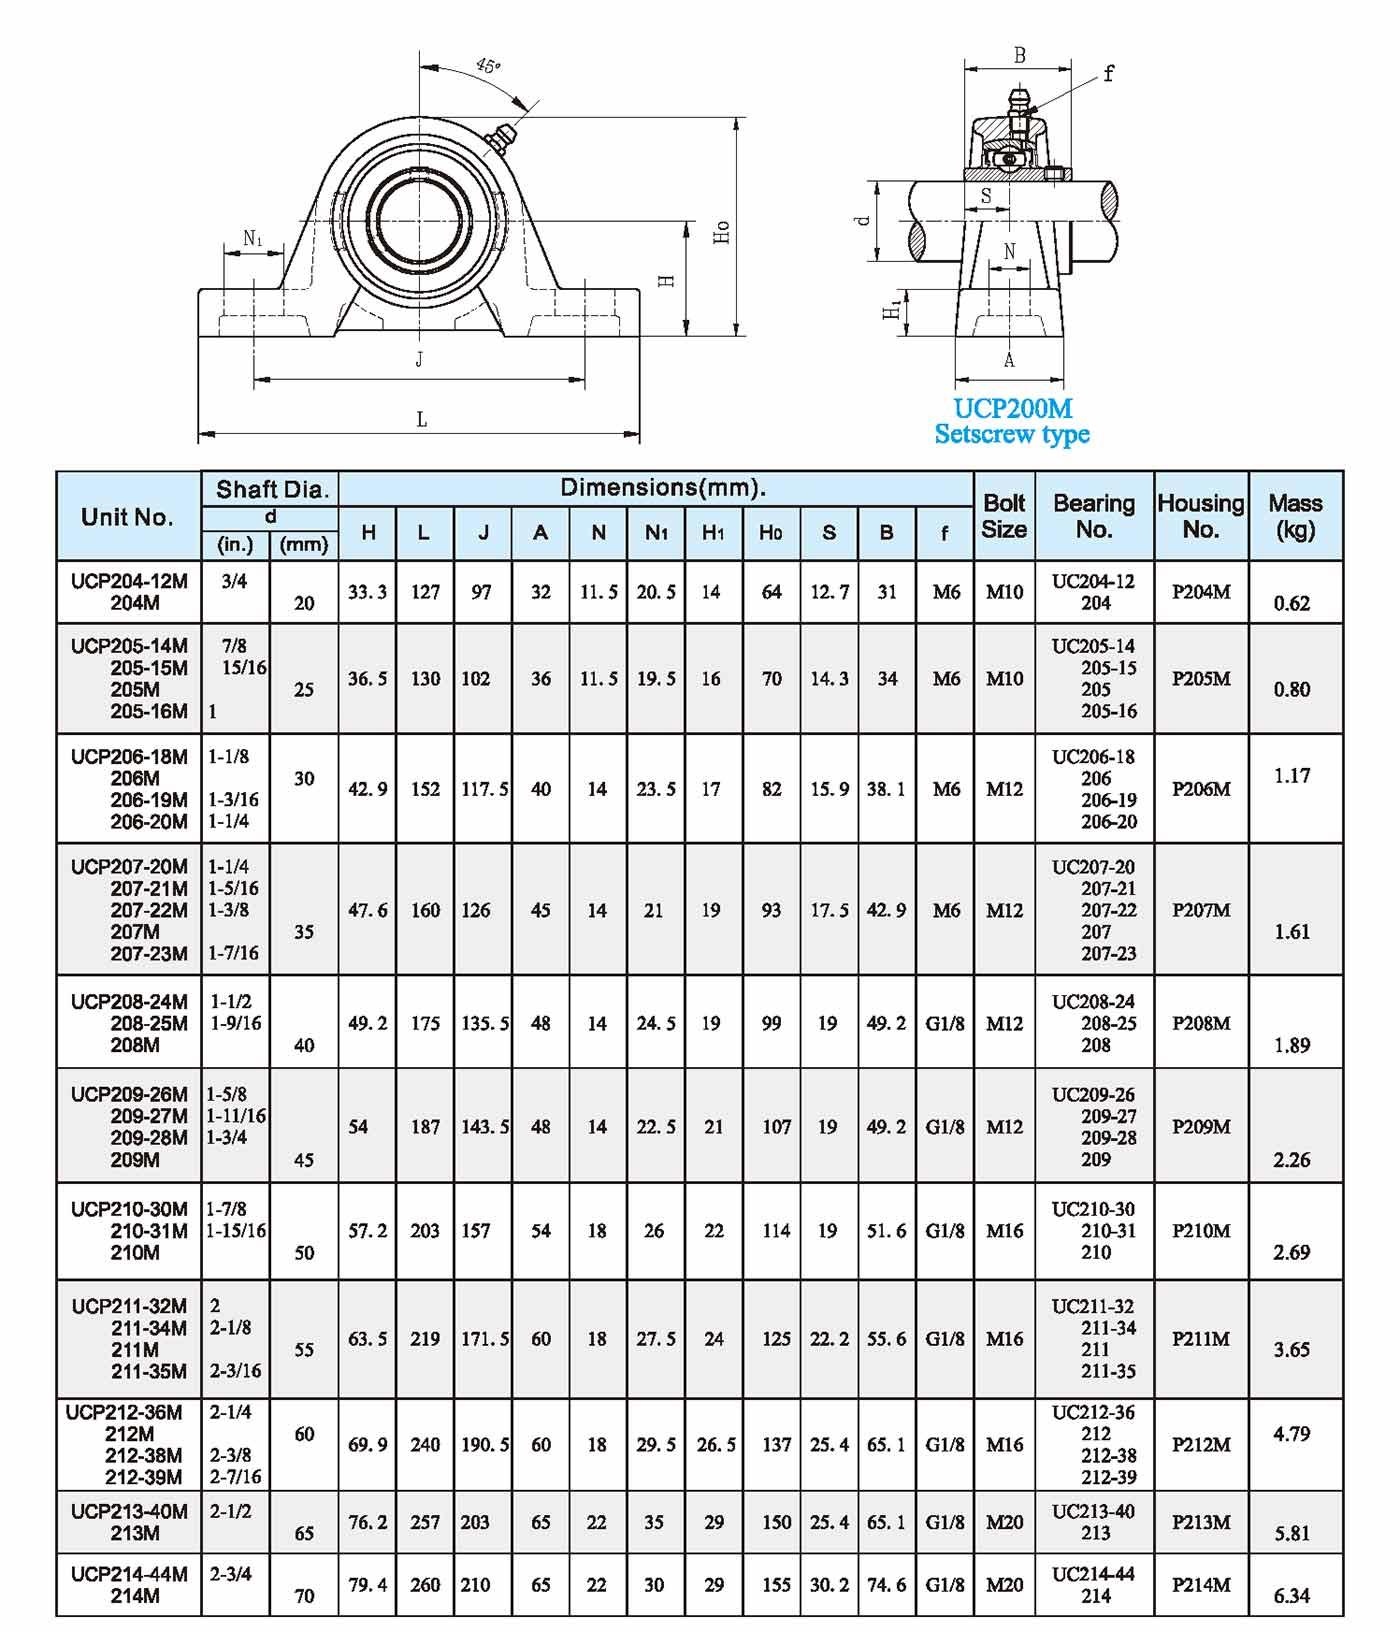 UCP200M Setscrew type